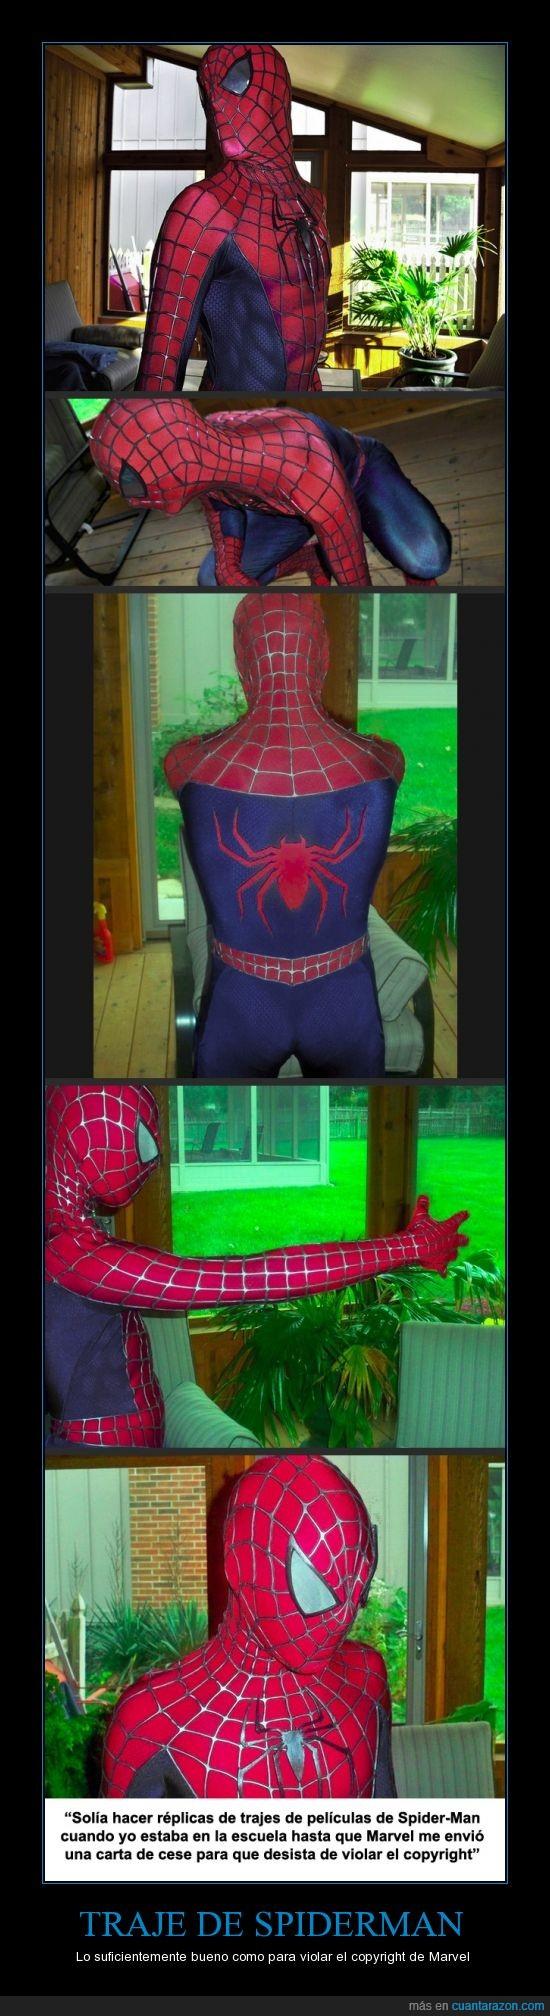 copyright,marvel,spiderman,traje